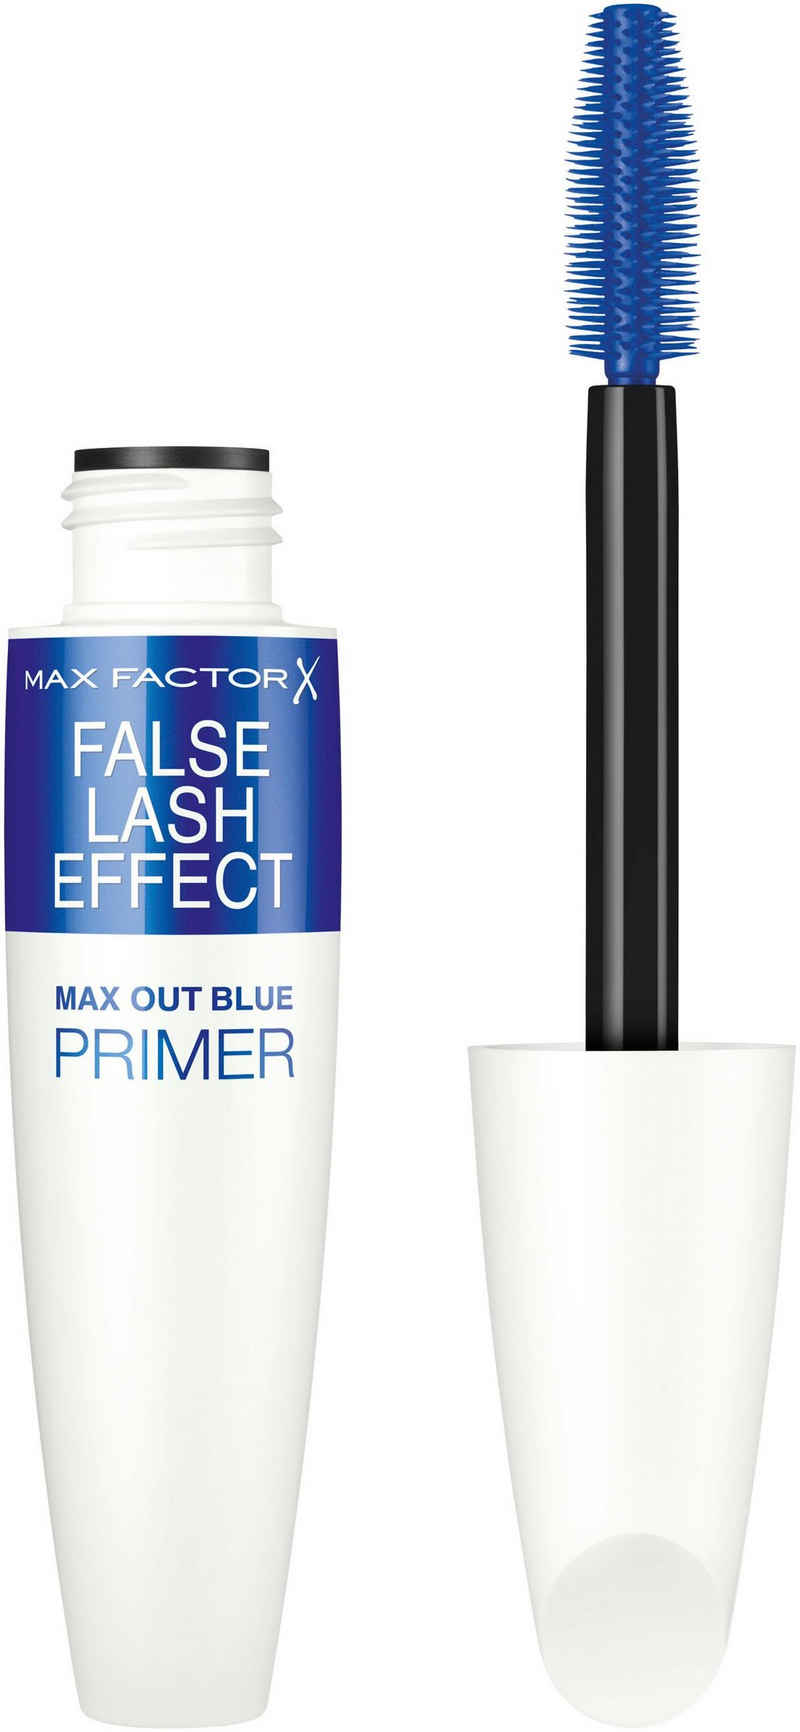 MAX FACTOR Mascara-Primer »False Lash Effect Maxout«